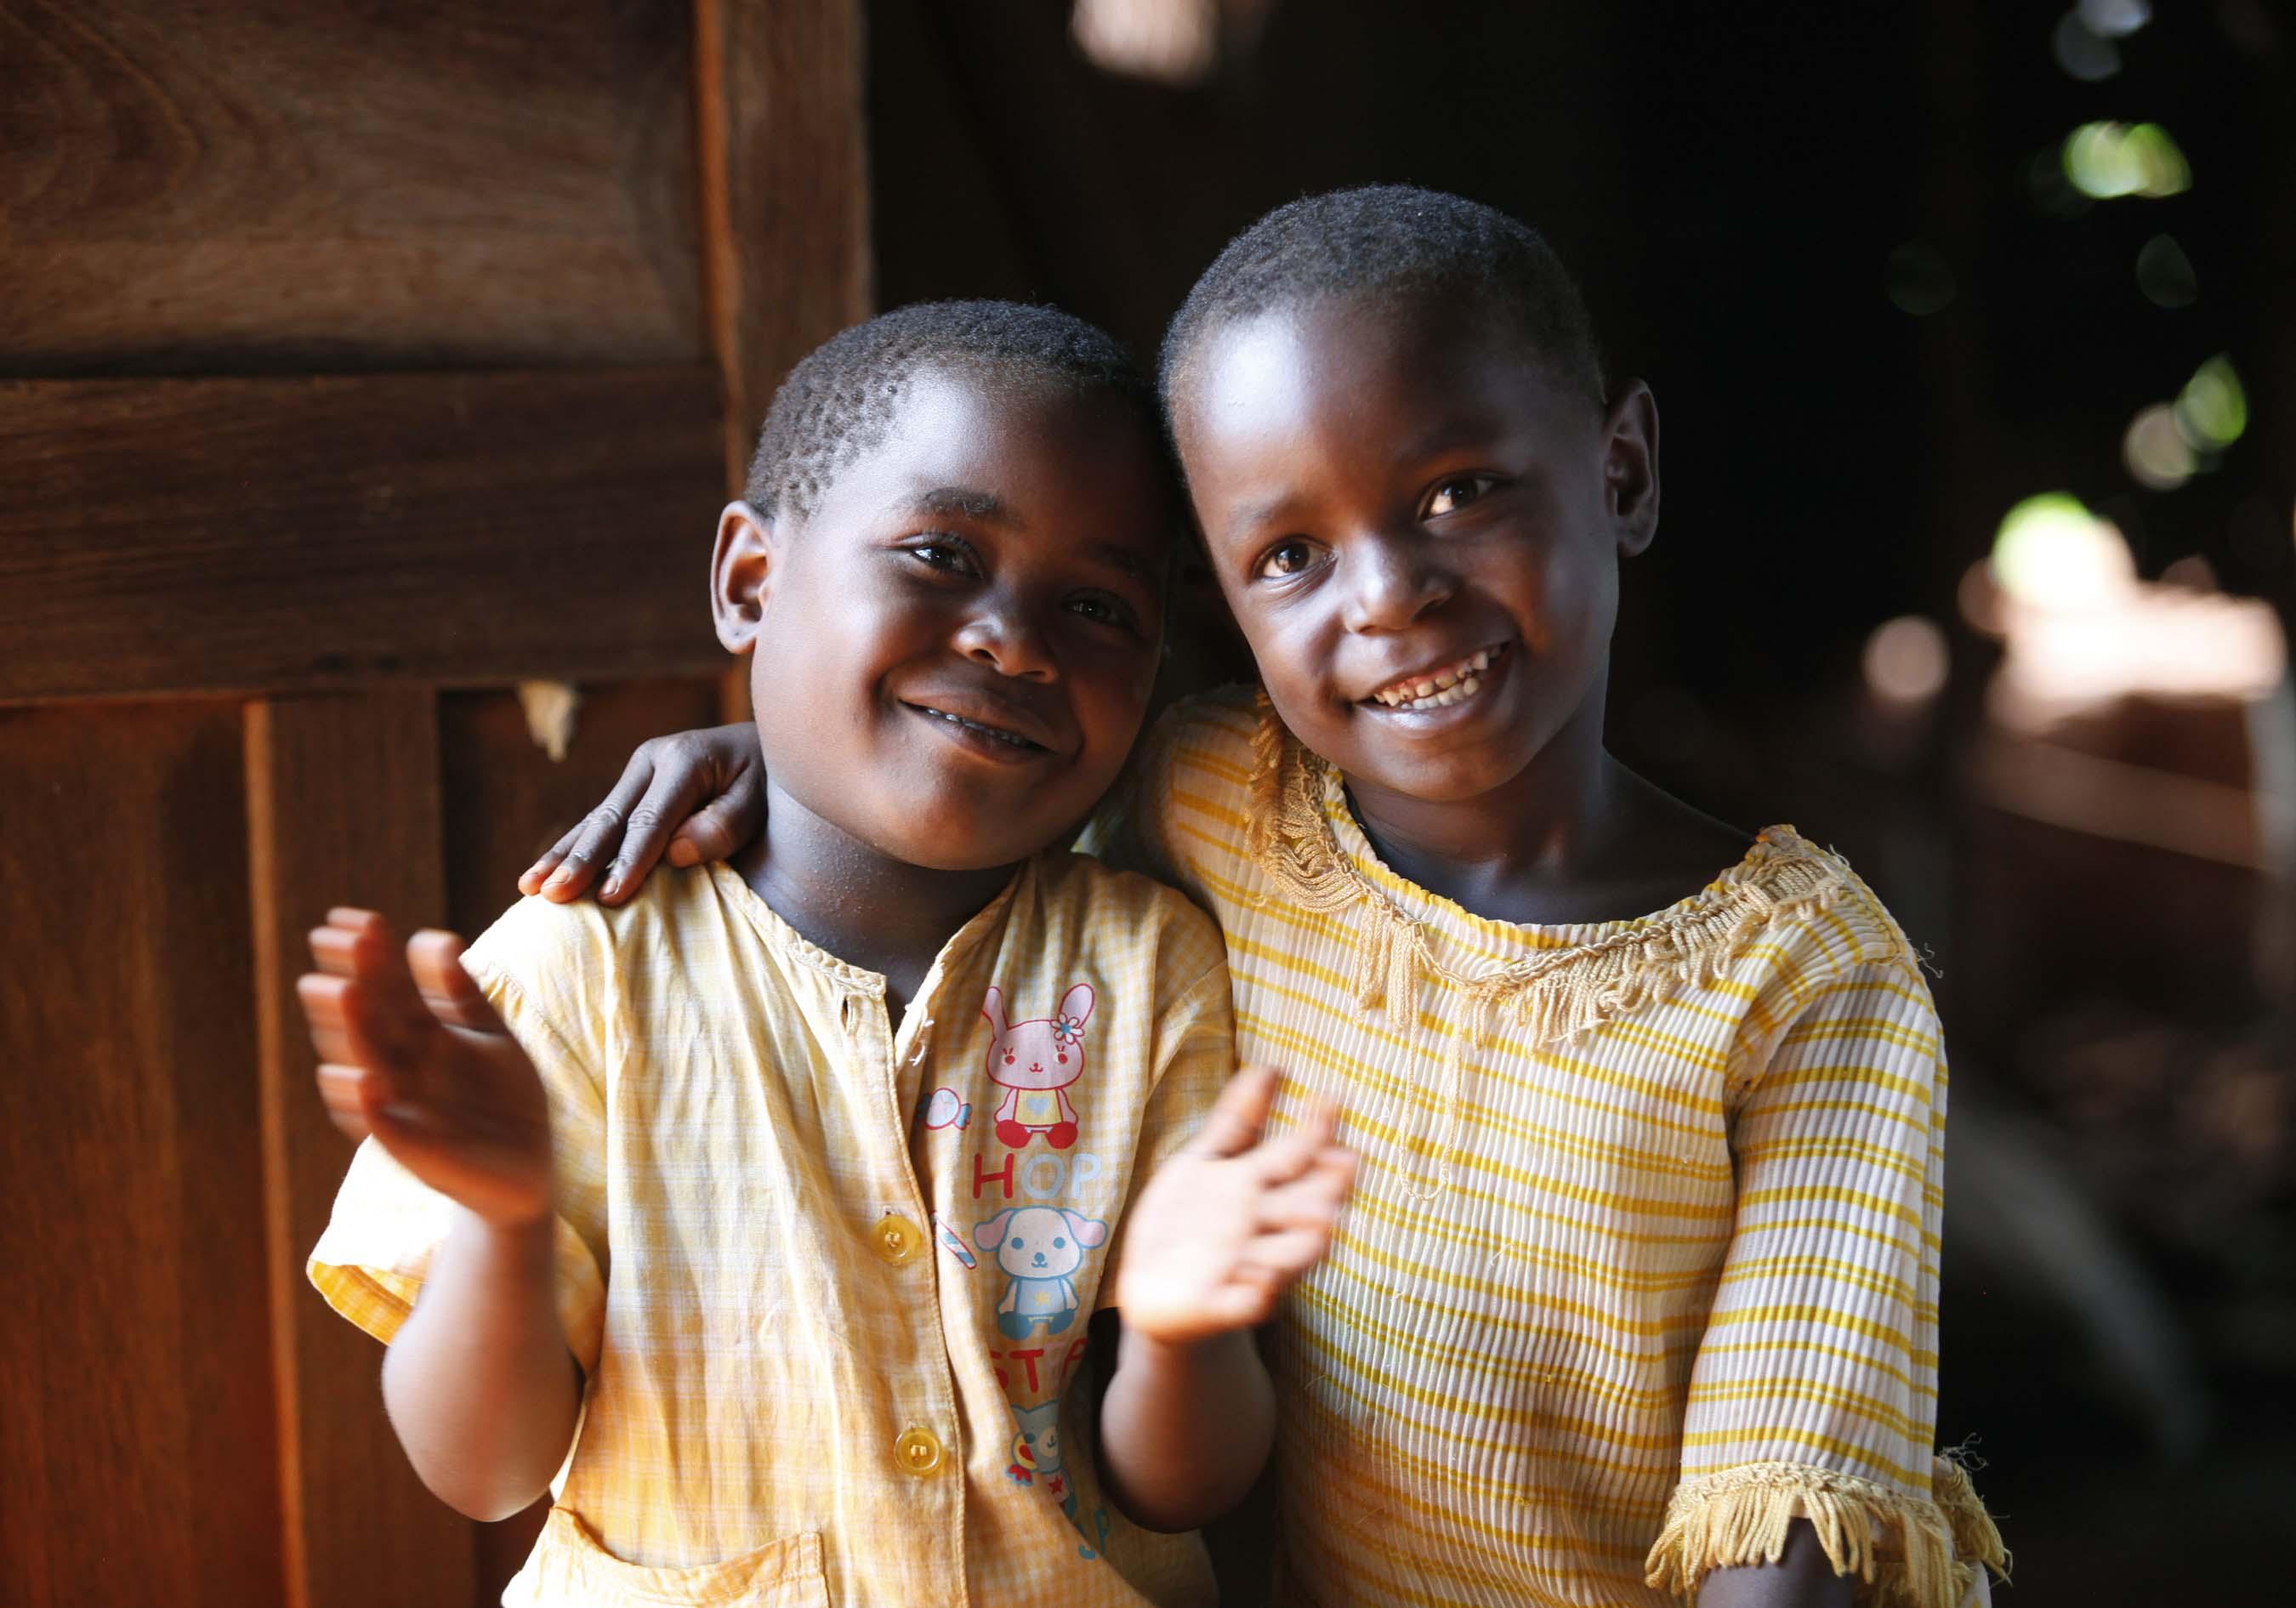 Children playing in Tanzania